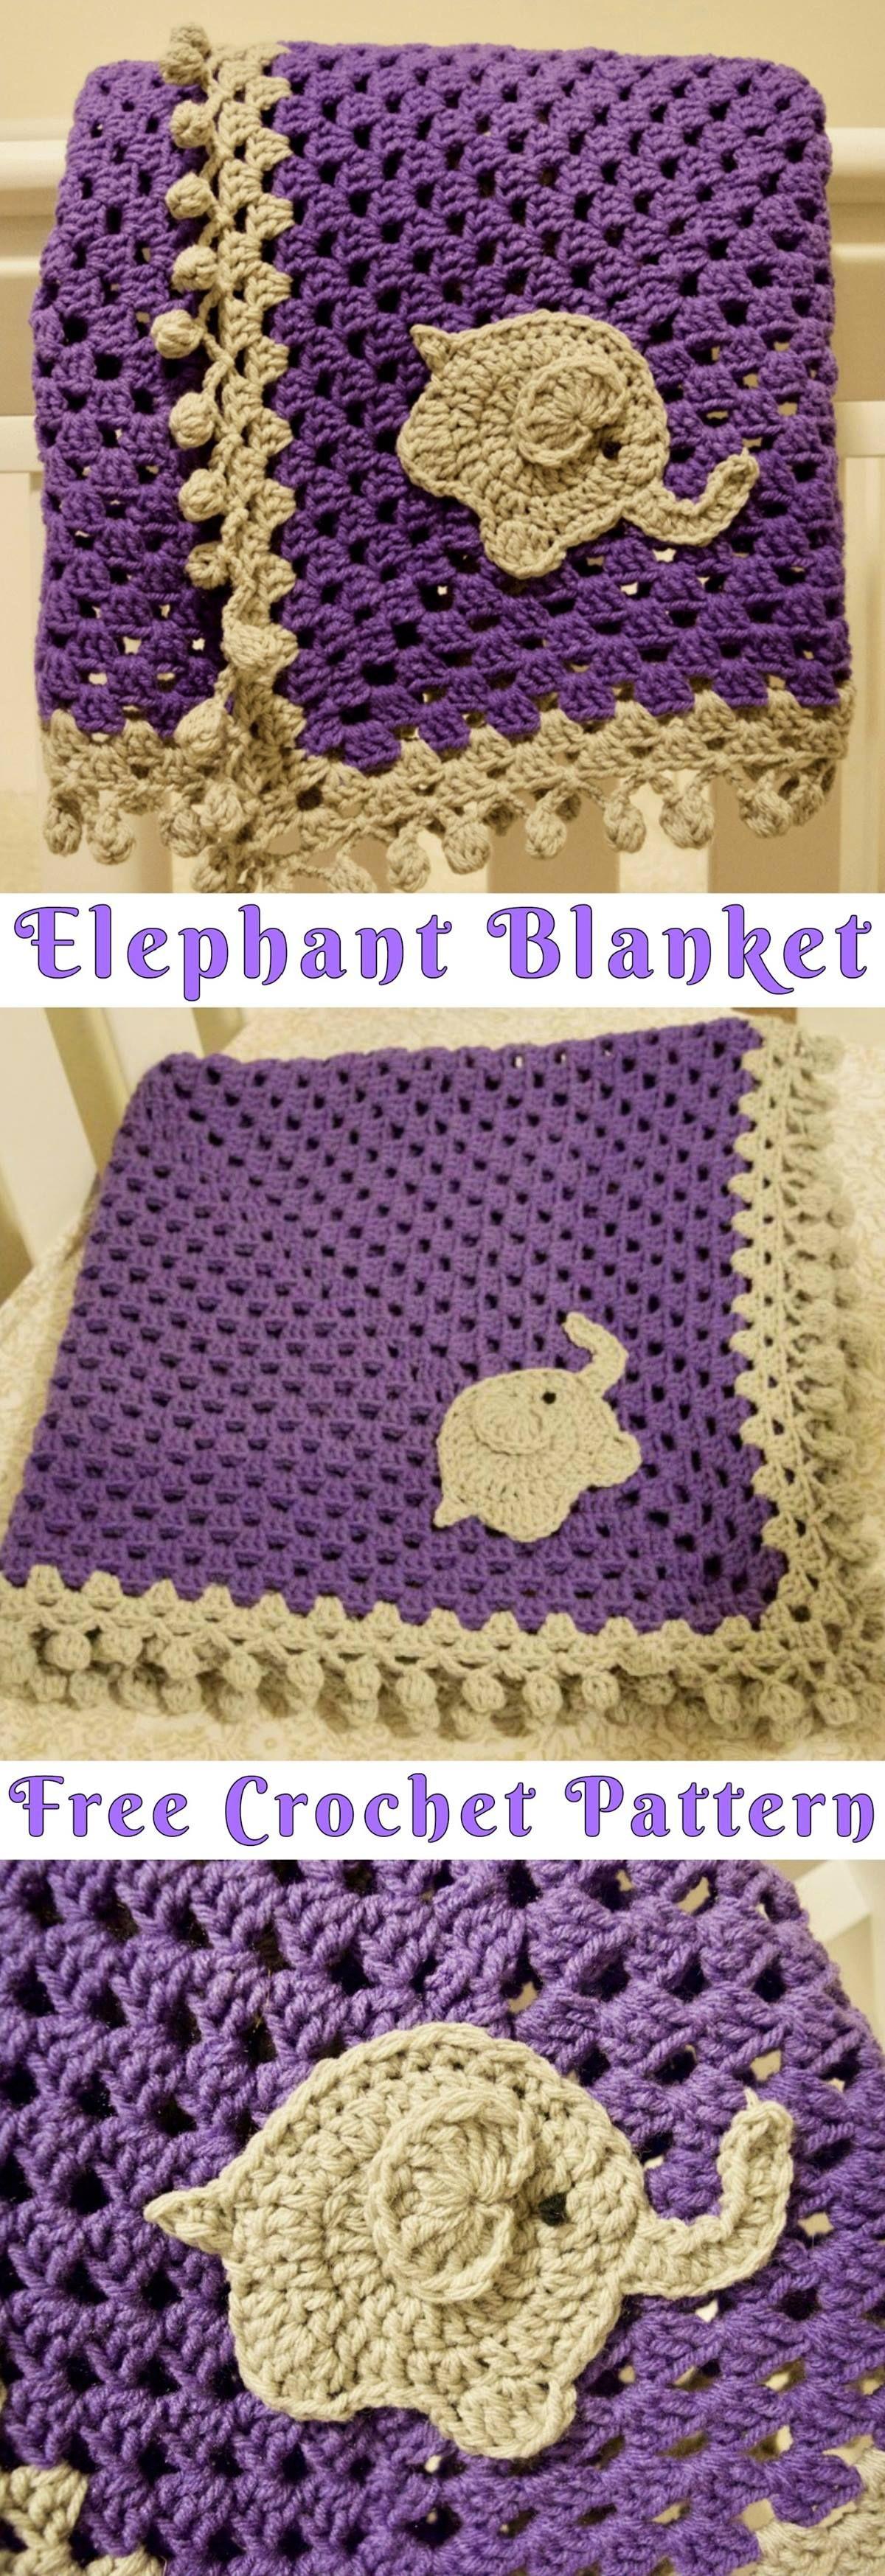 Elephant Blanket Free Crochet Pattern | Miniatur, Häkeln und Puppen